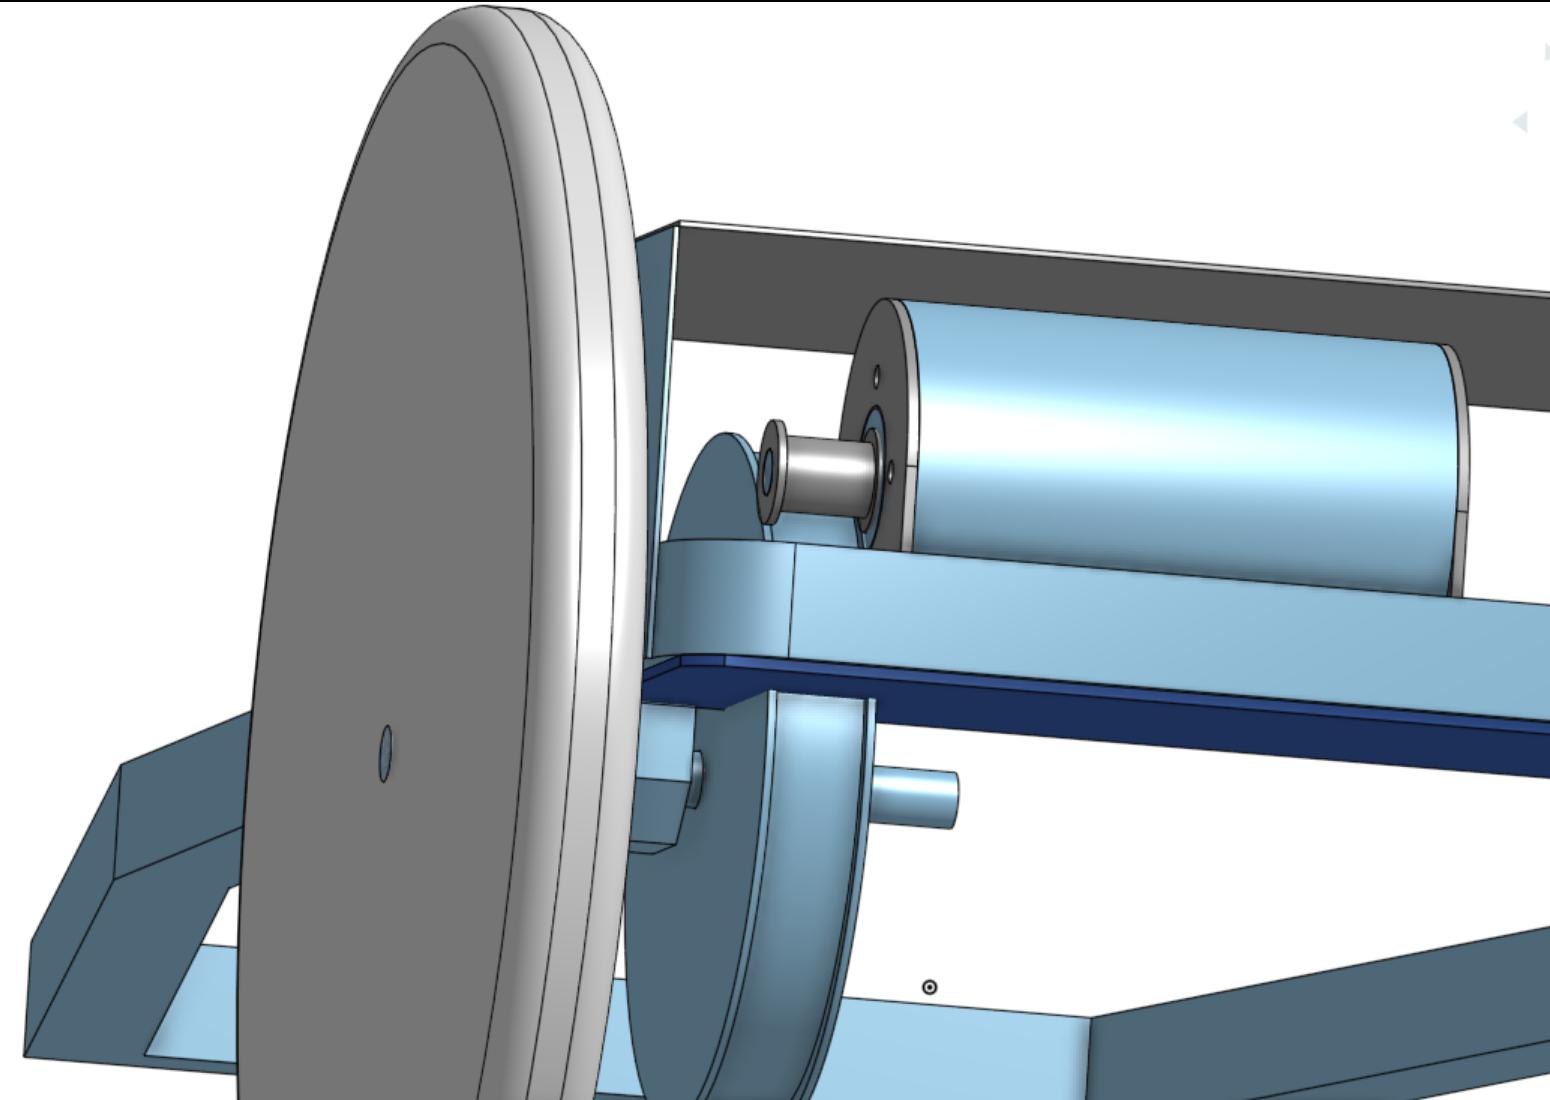 CAD model shows error